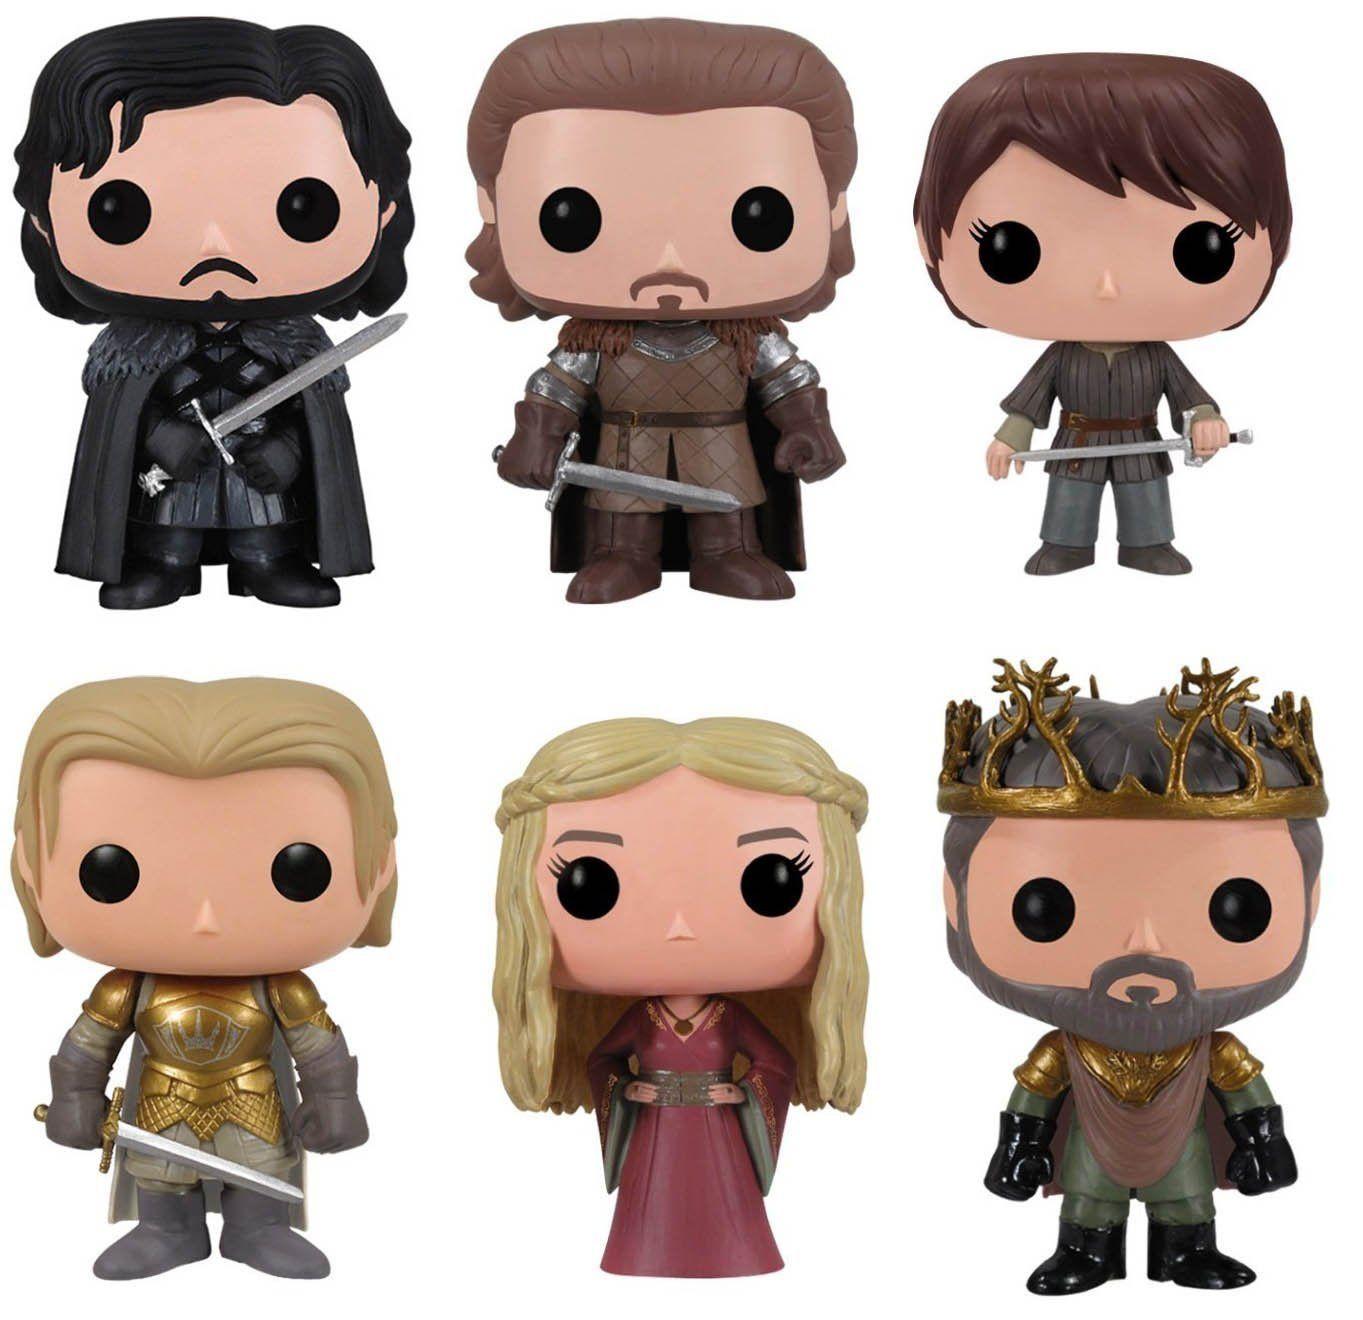 Game Of Thrones Jon Snow, Robb Stark, Arya Stark, Jamie